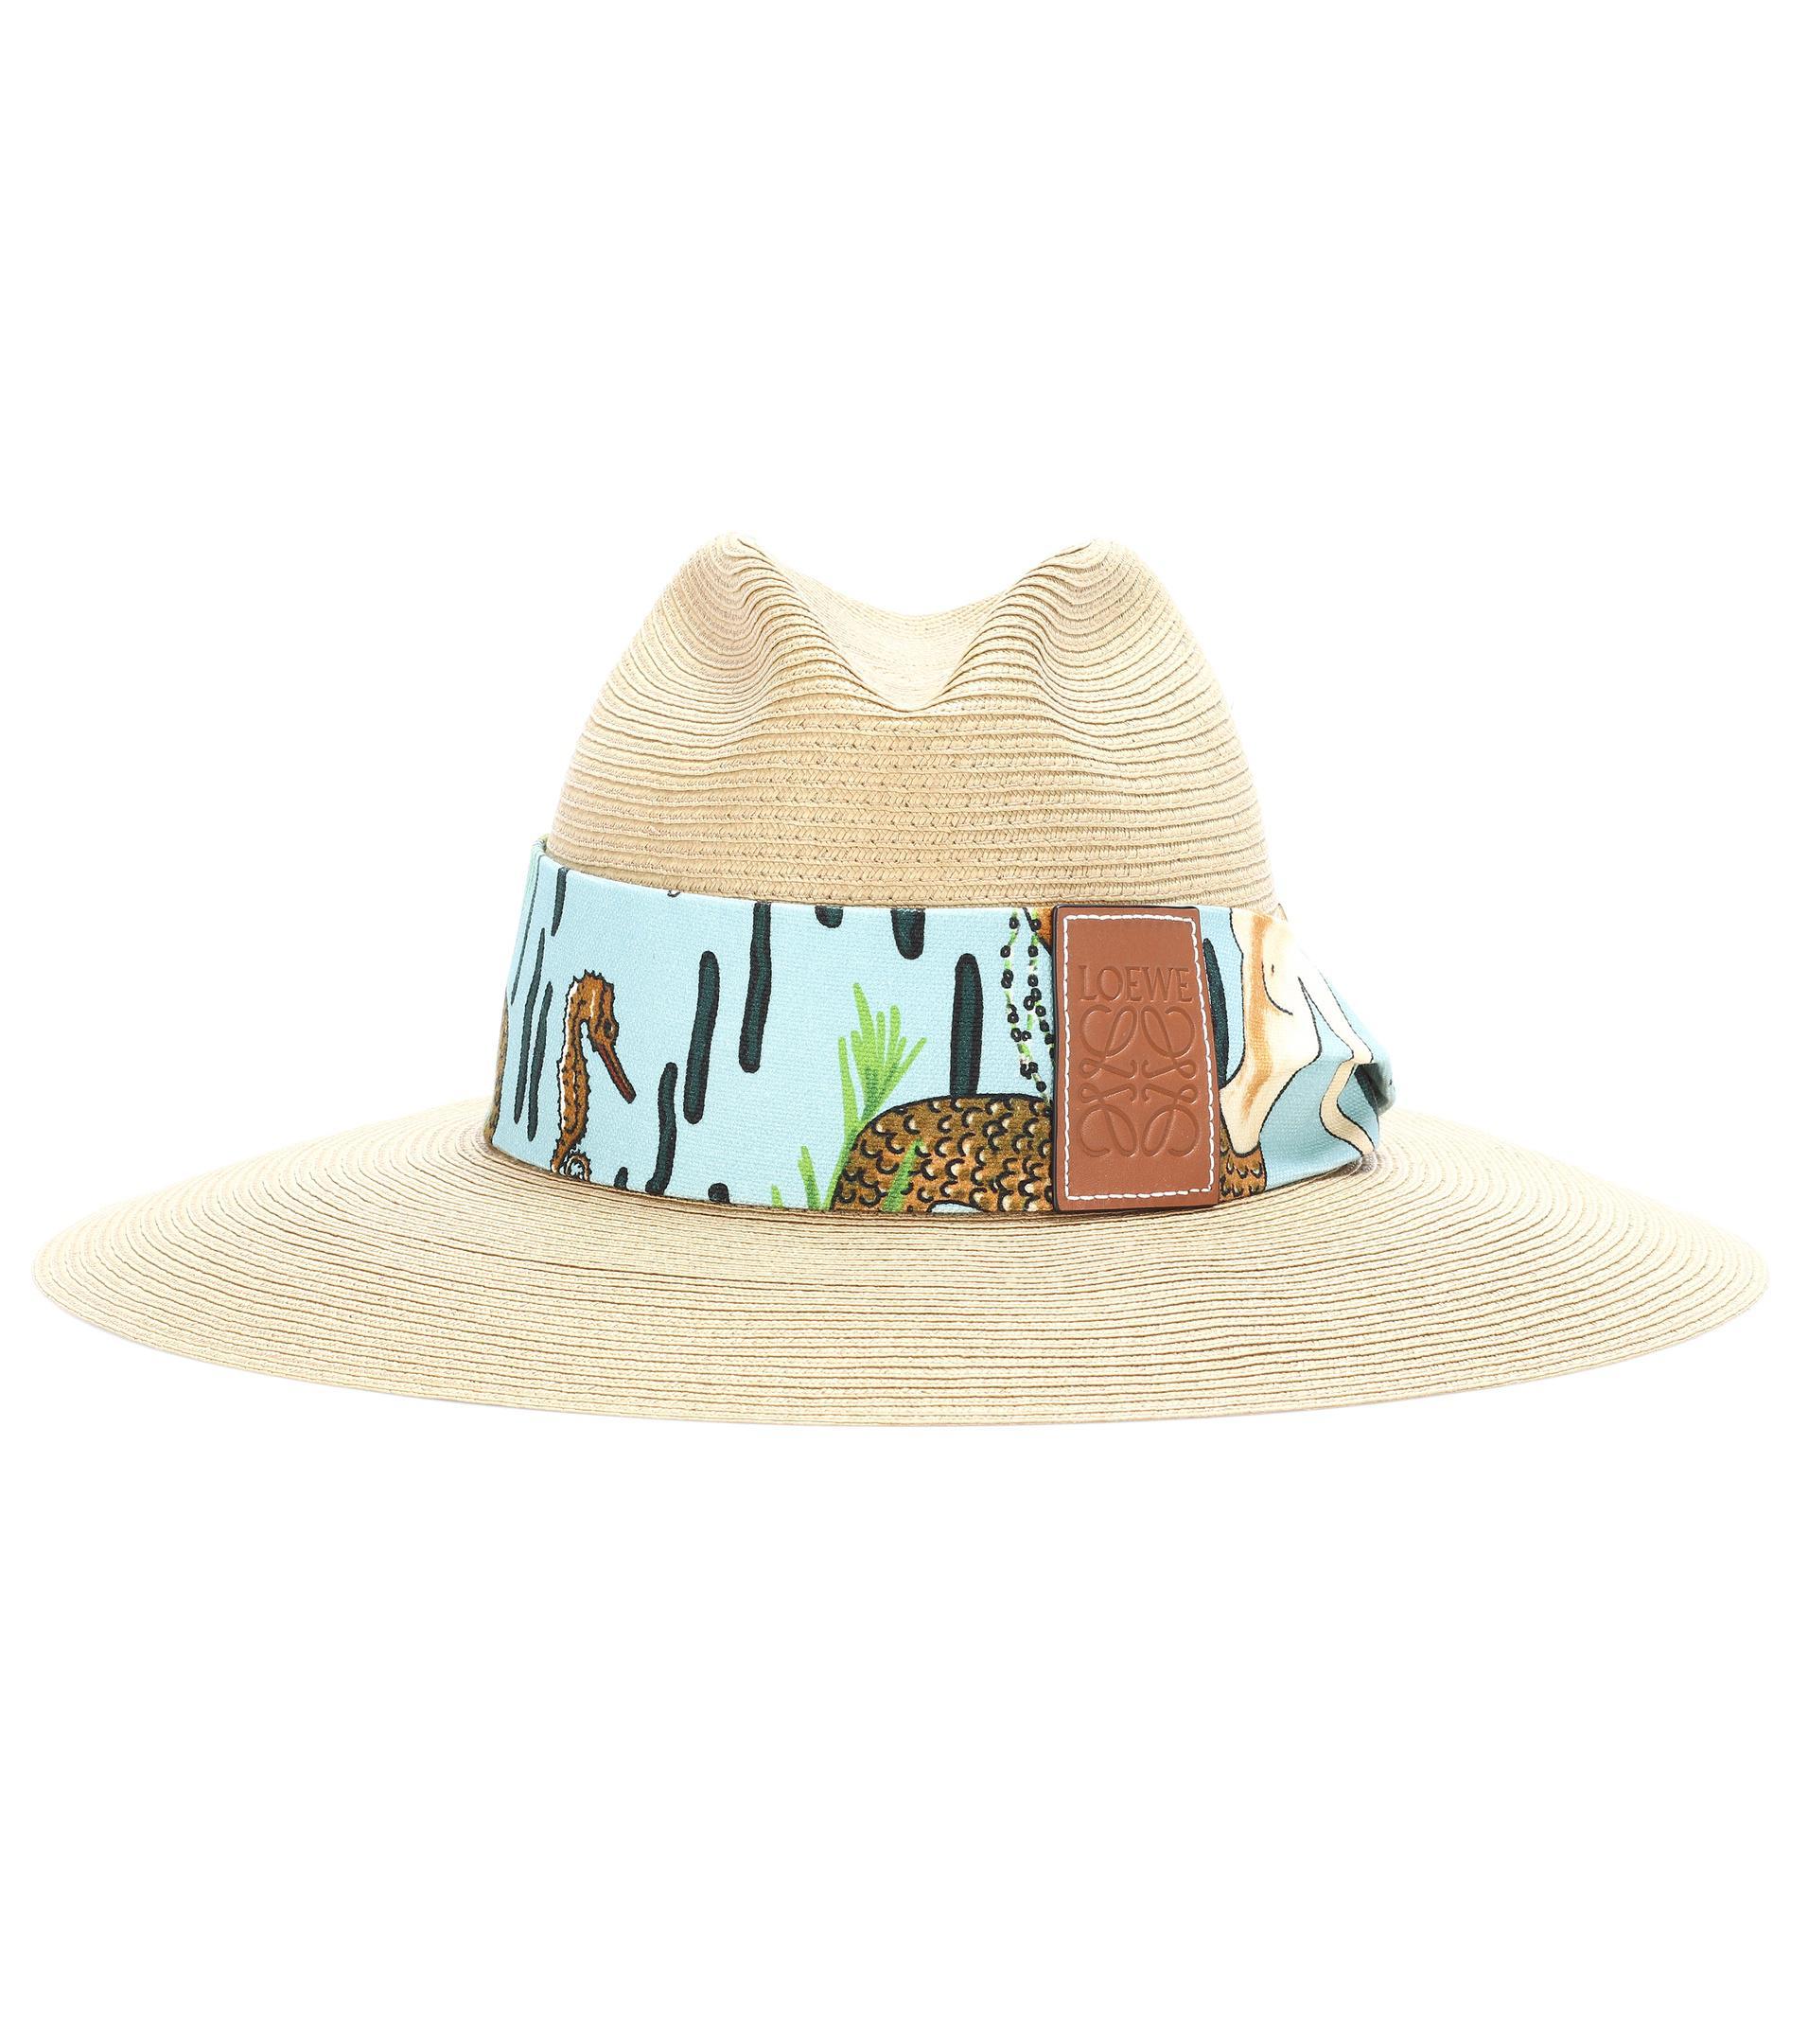 d9bc89ddc4fff1 Loewe X Paula's Ibiza Dorfman Hat in Natural - Lyst